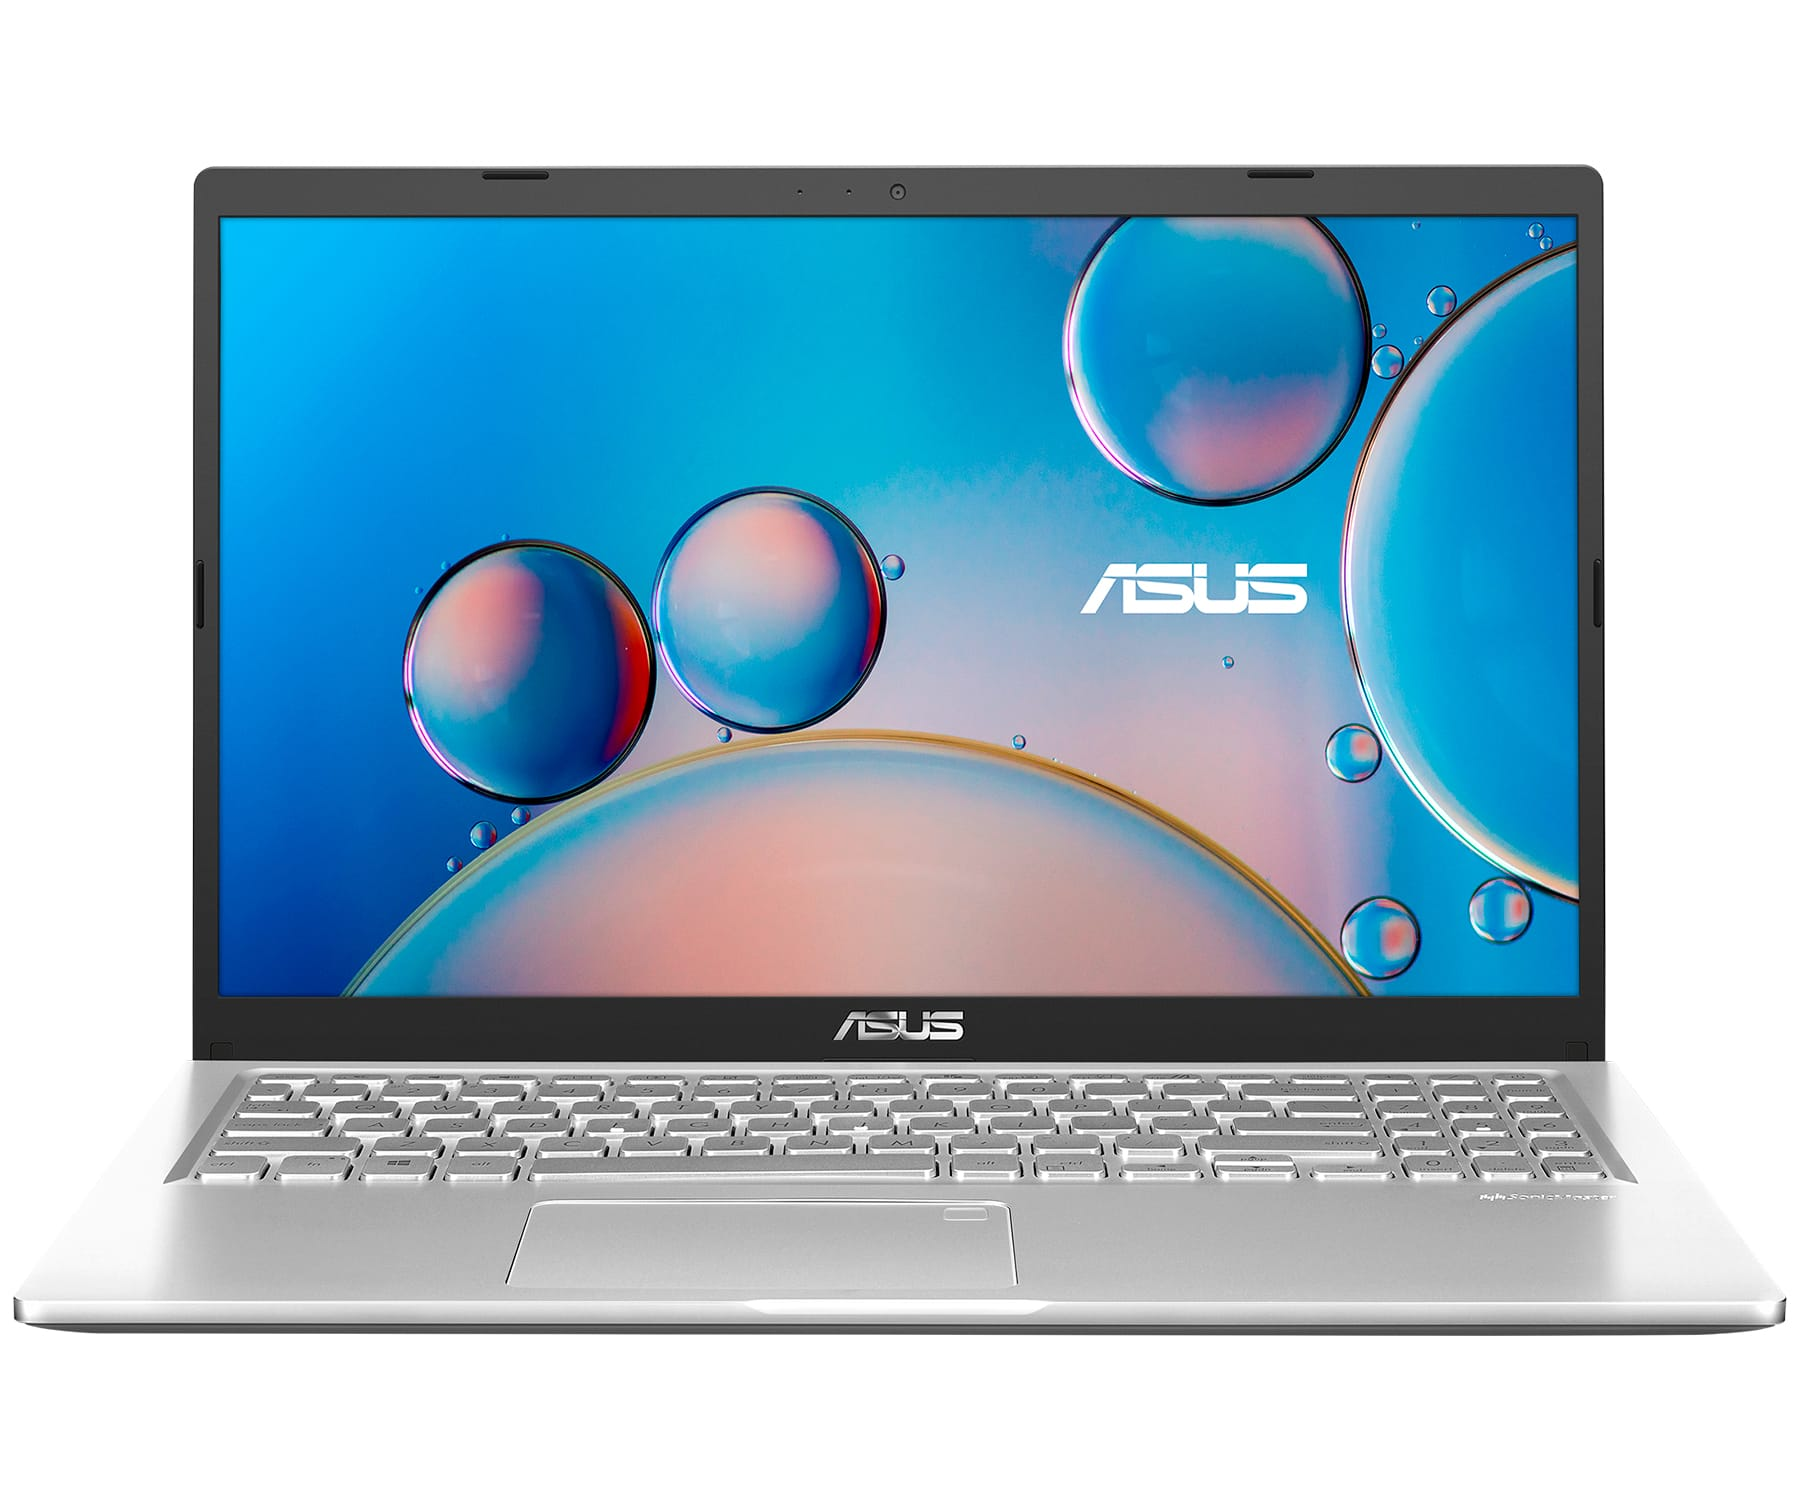 "ASUS VIVOBOOK F515 PORTÁTIL PLATA 15.6"" HD+ / CORE I3-1115G4 / 8GB / 256GB SSD / WINDOWS"